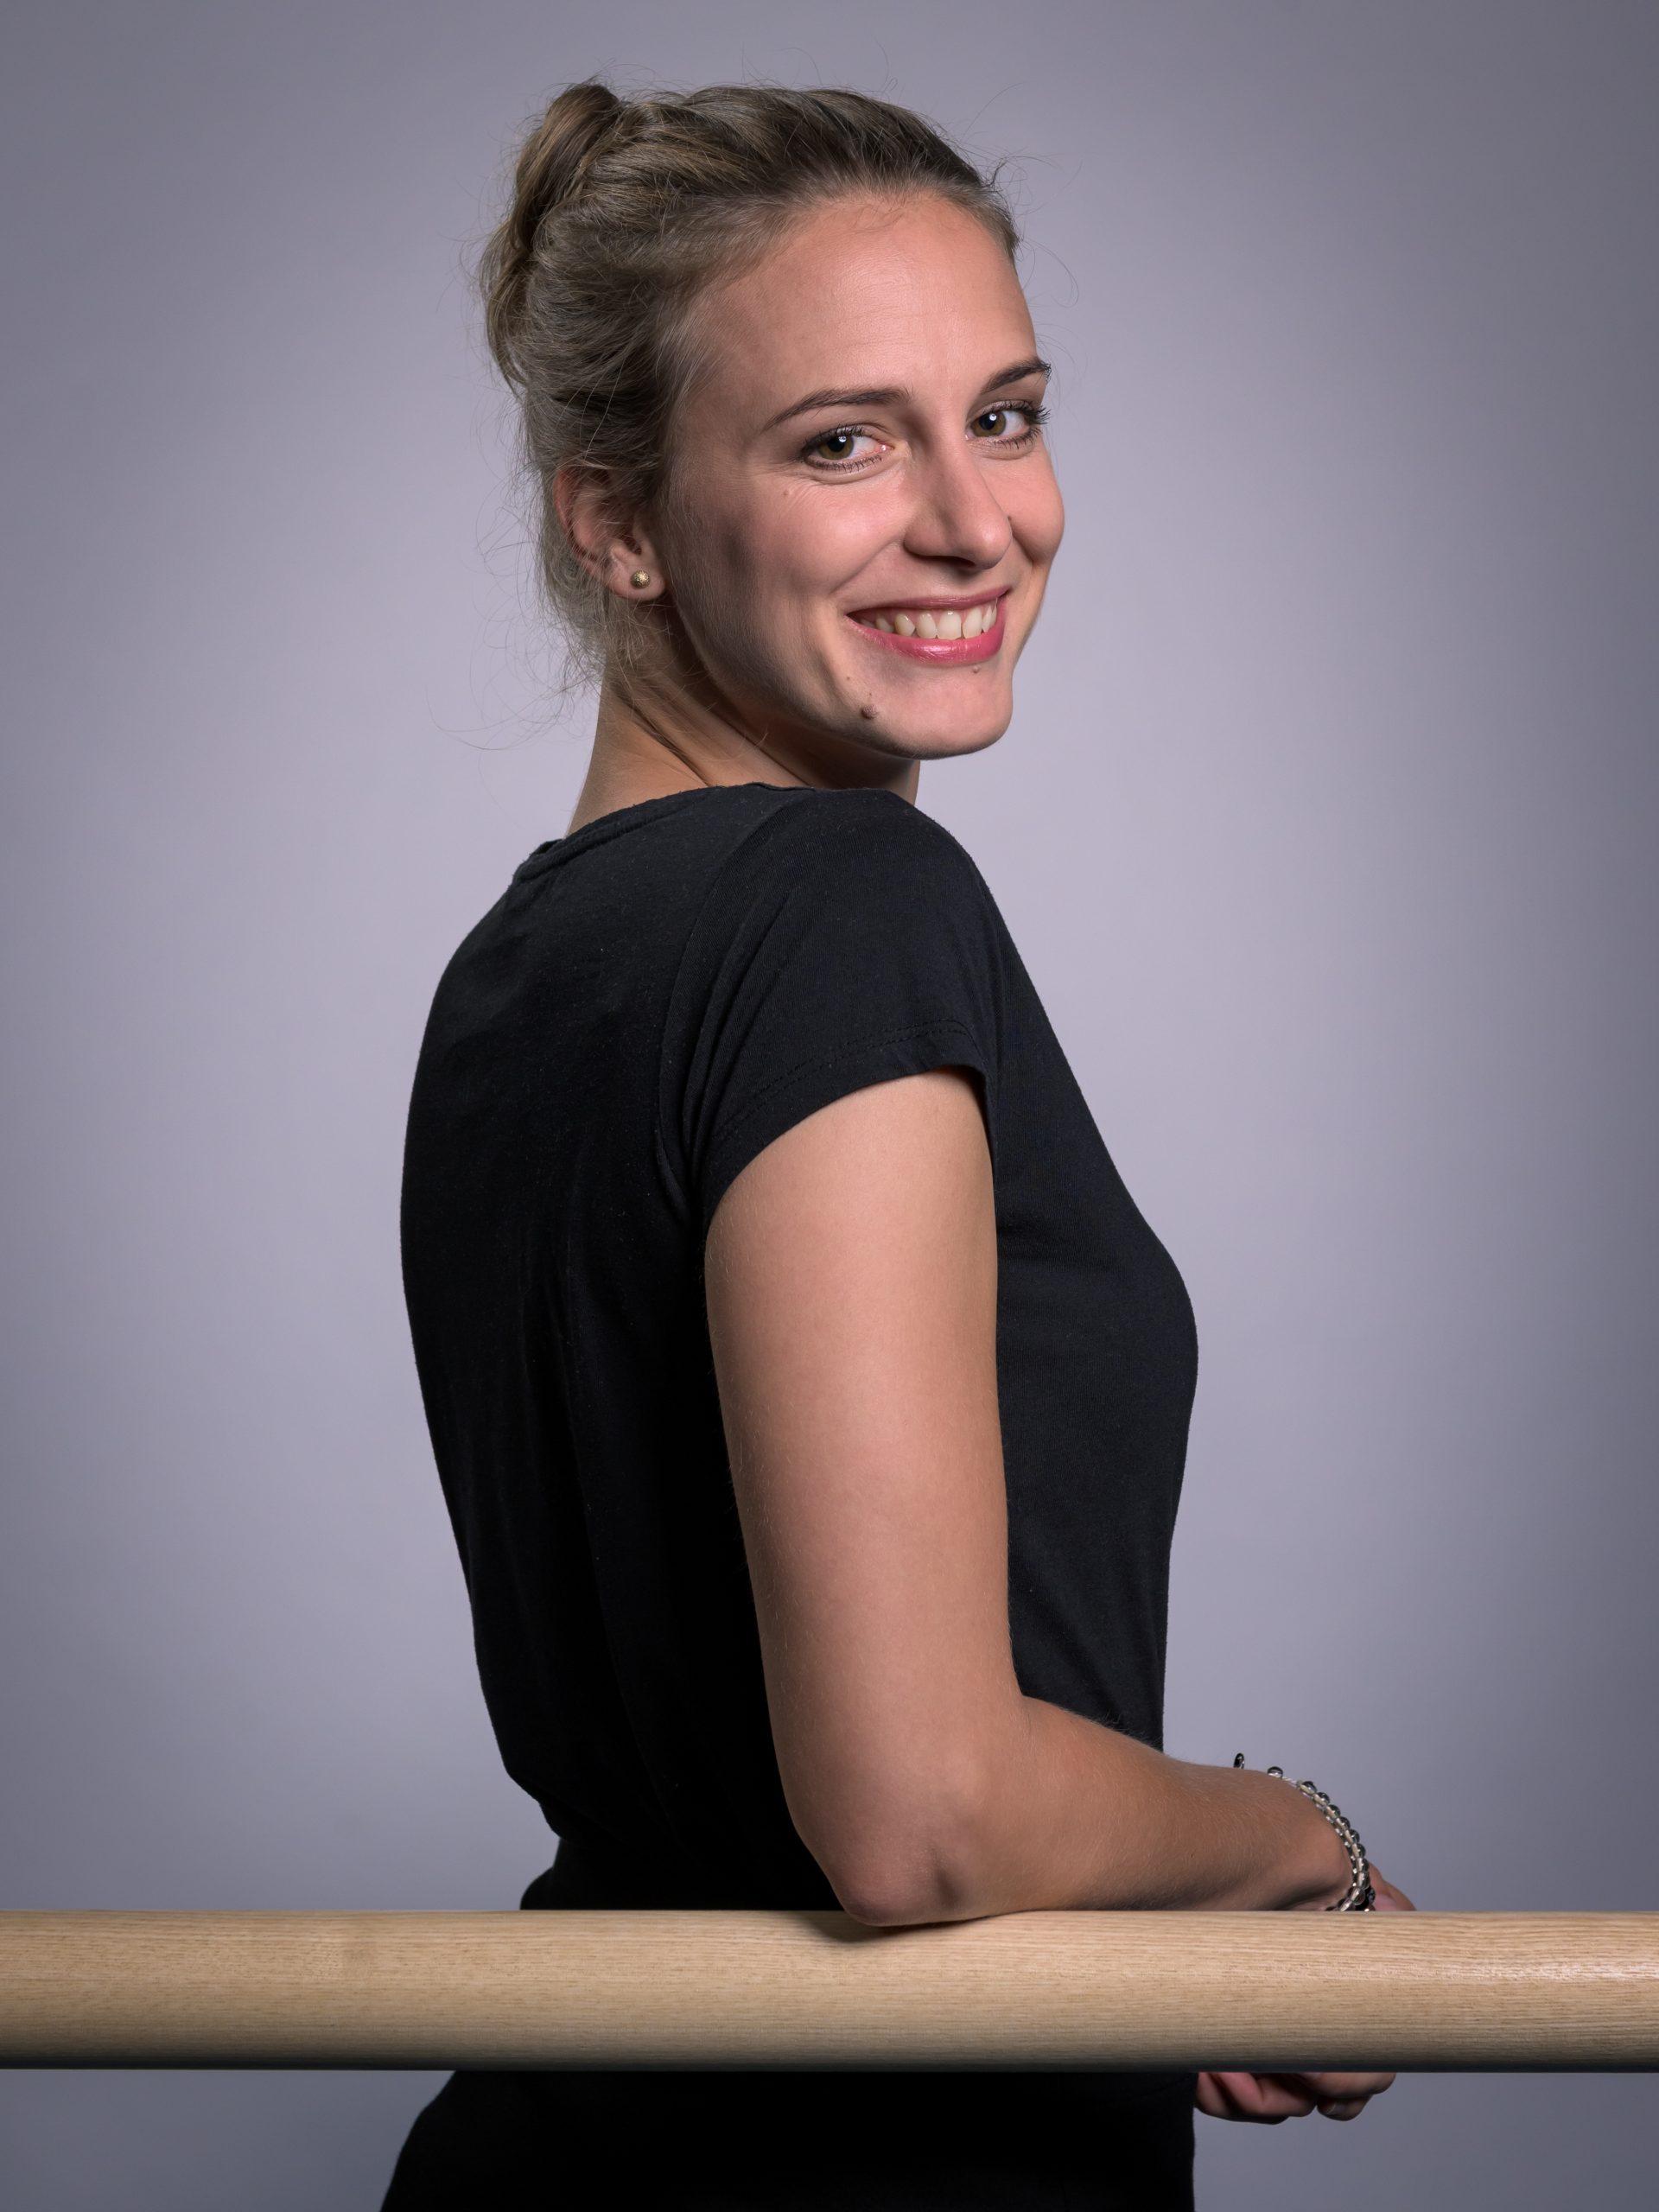 Barbora Hniličková